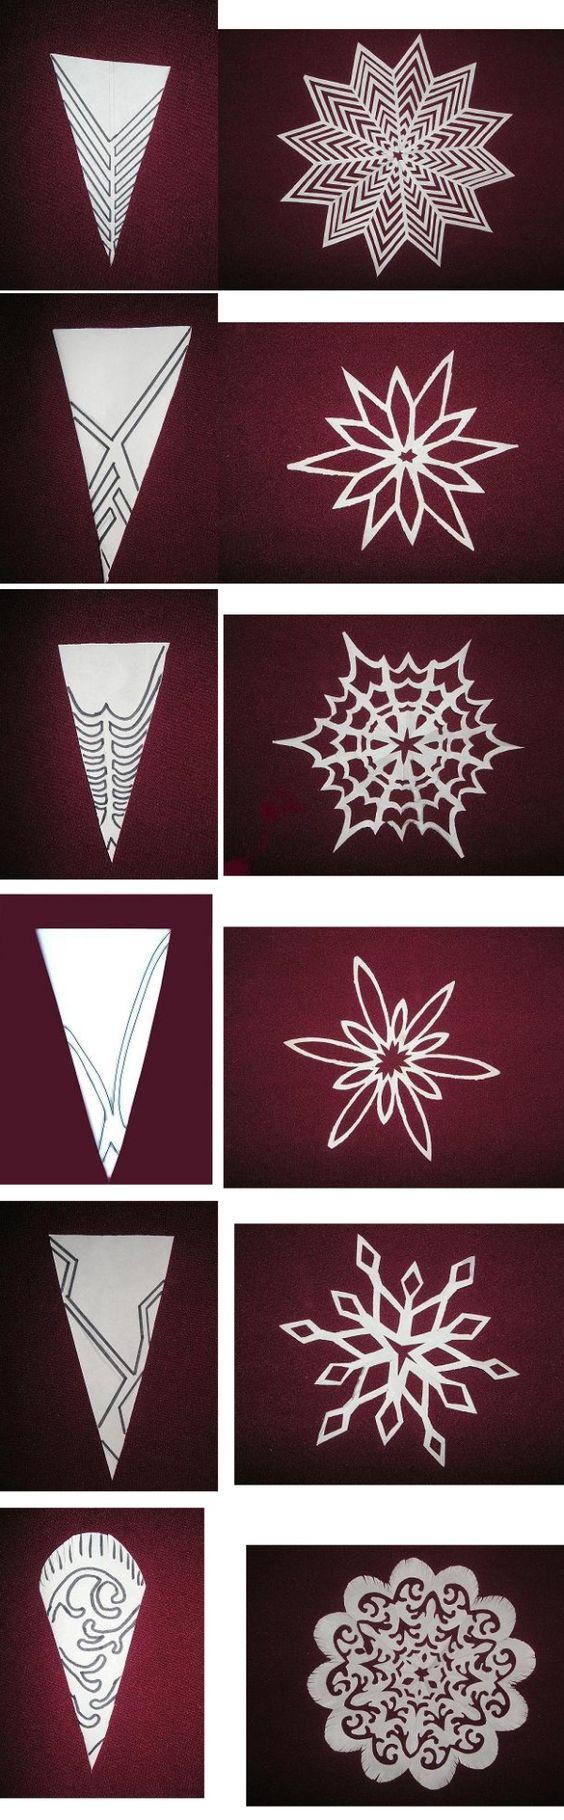 Pin de Shelly Weaver en Ideas | Pinterest | Cemento, Filigrana y ...